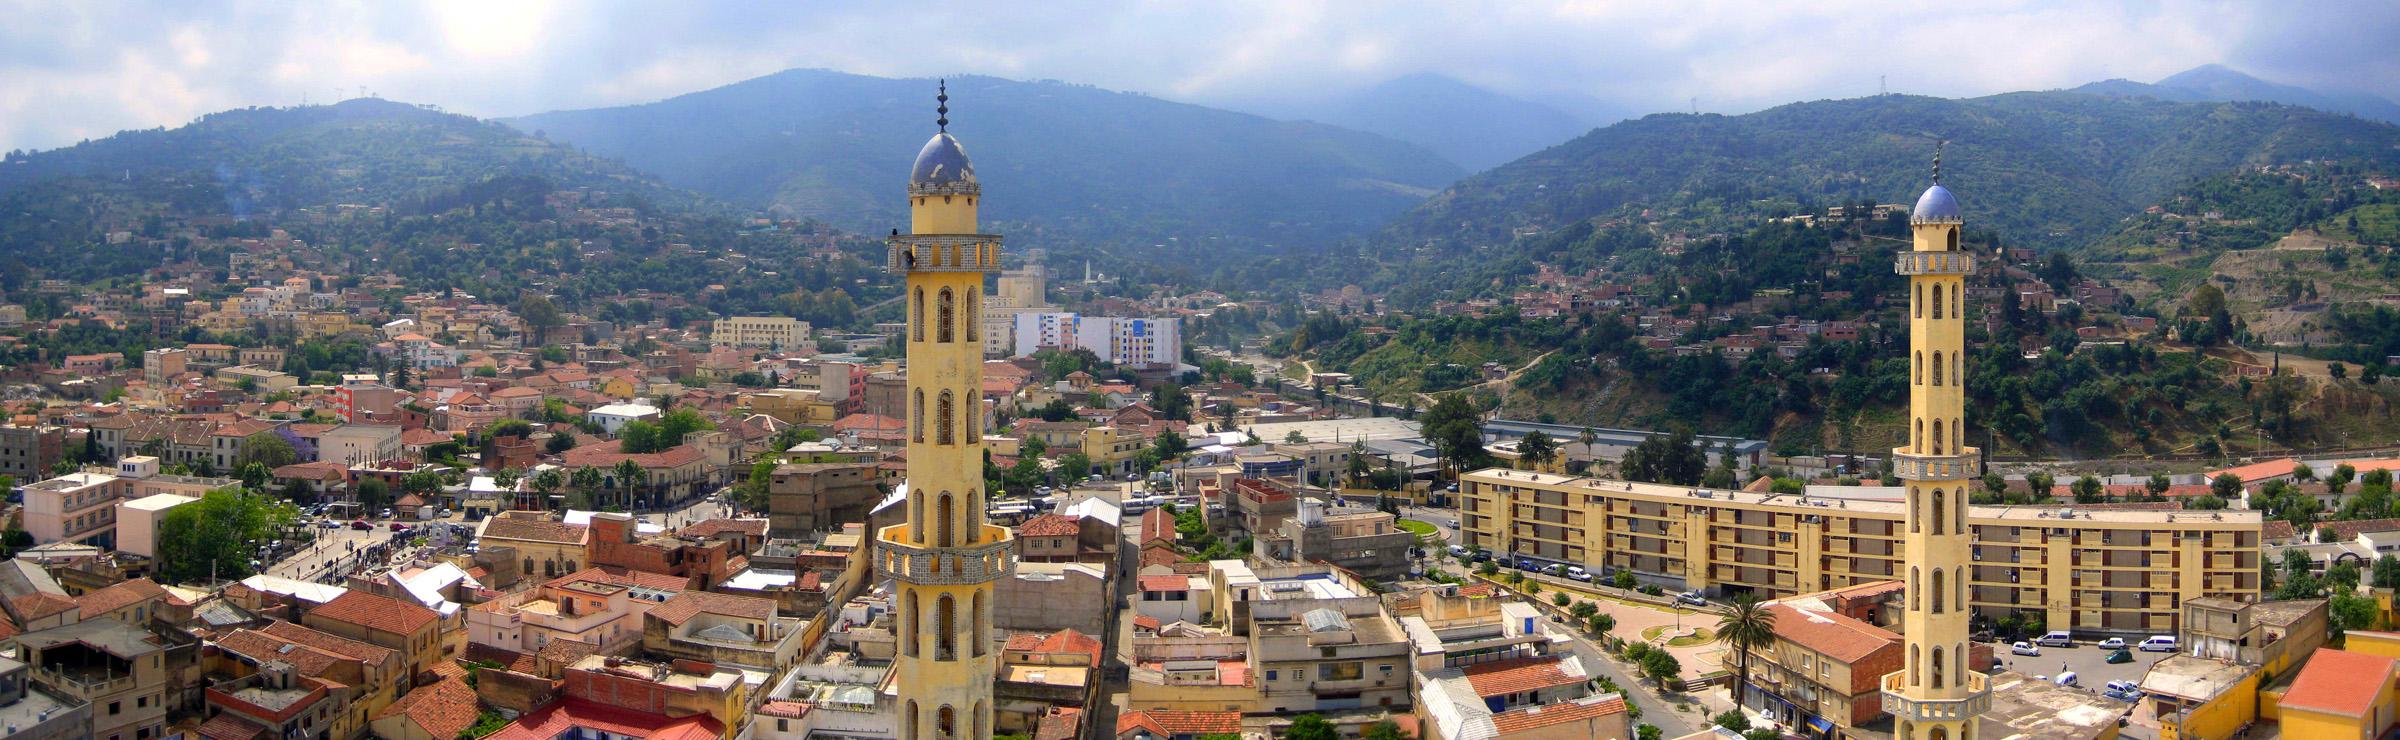 Bab E'rrahba in Blida, Algeria - by Bachir